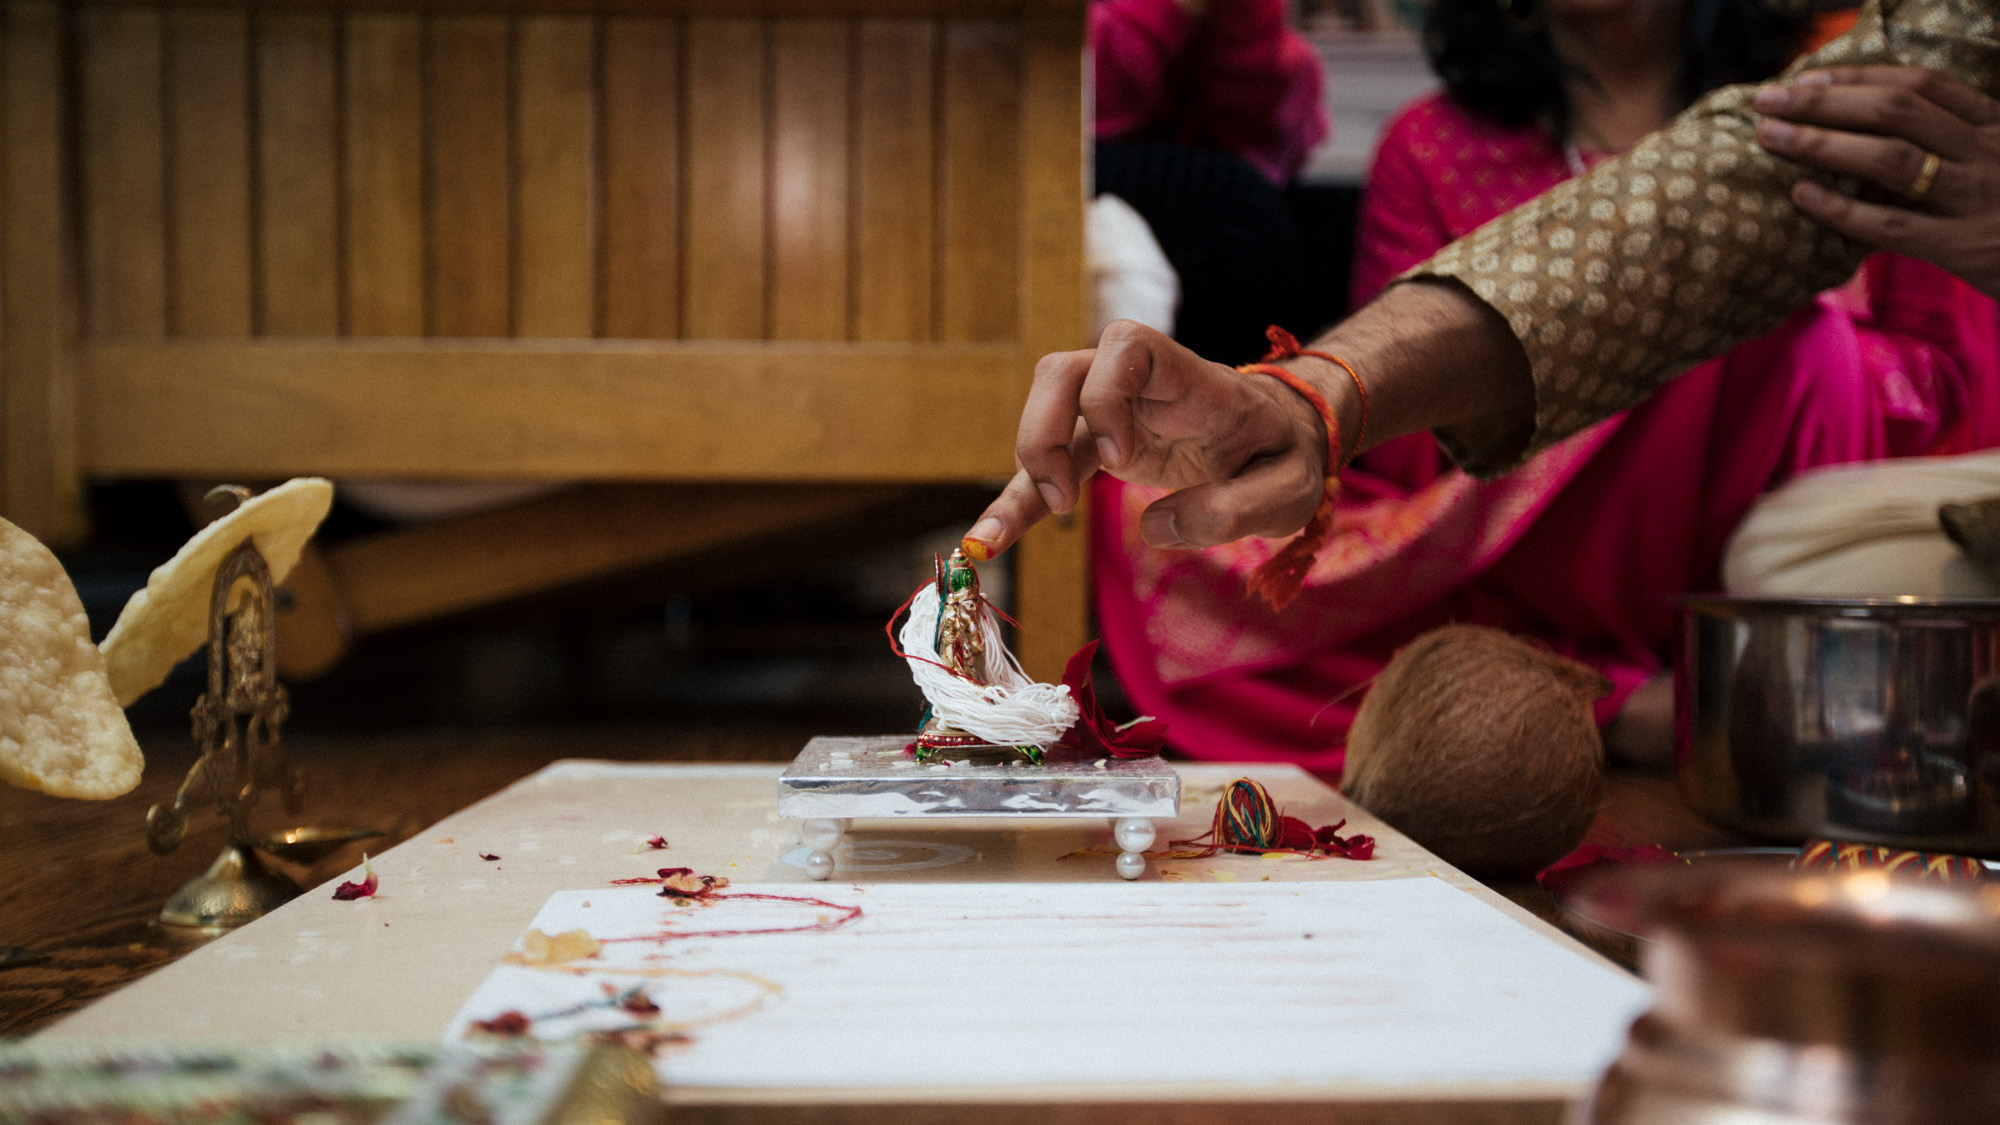 anu_maneesh_alec_vanderboom_Indian_wedding_photography-0189.jpg